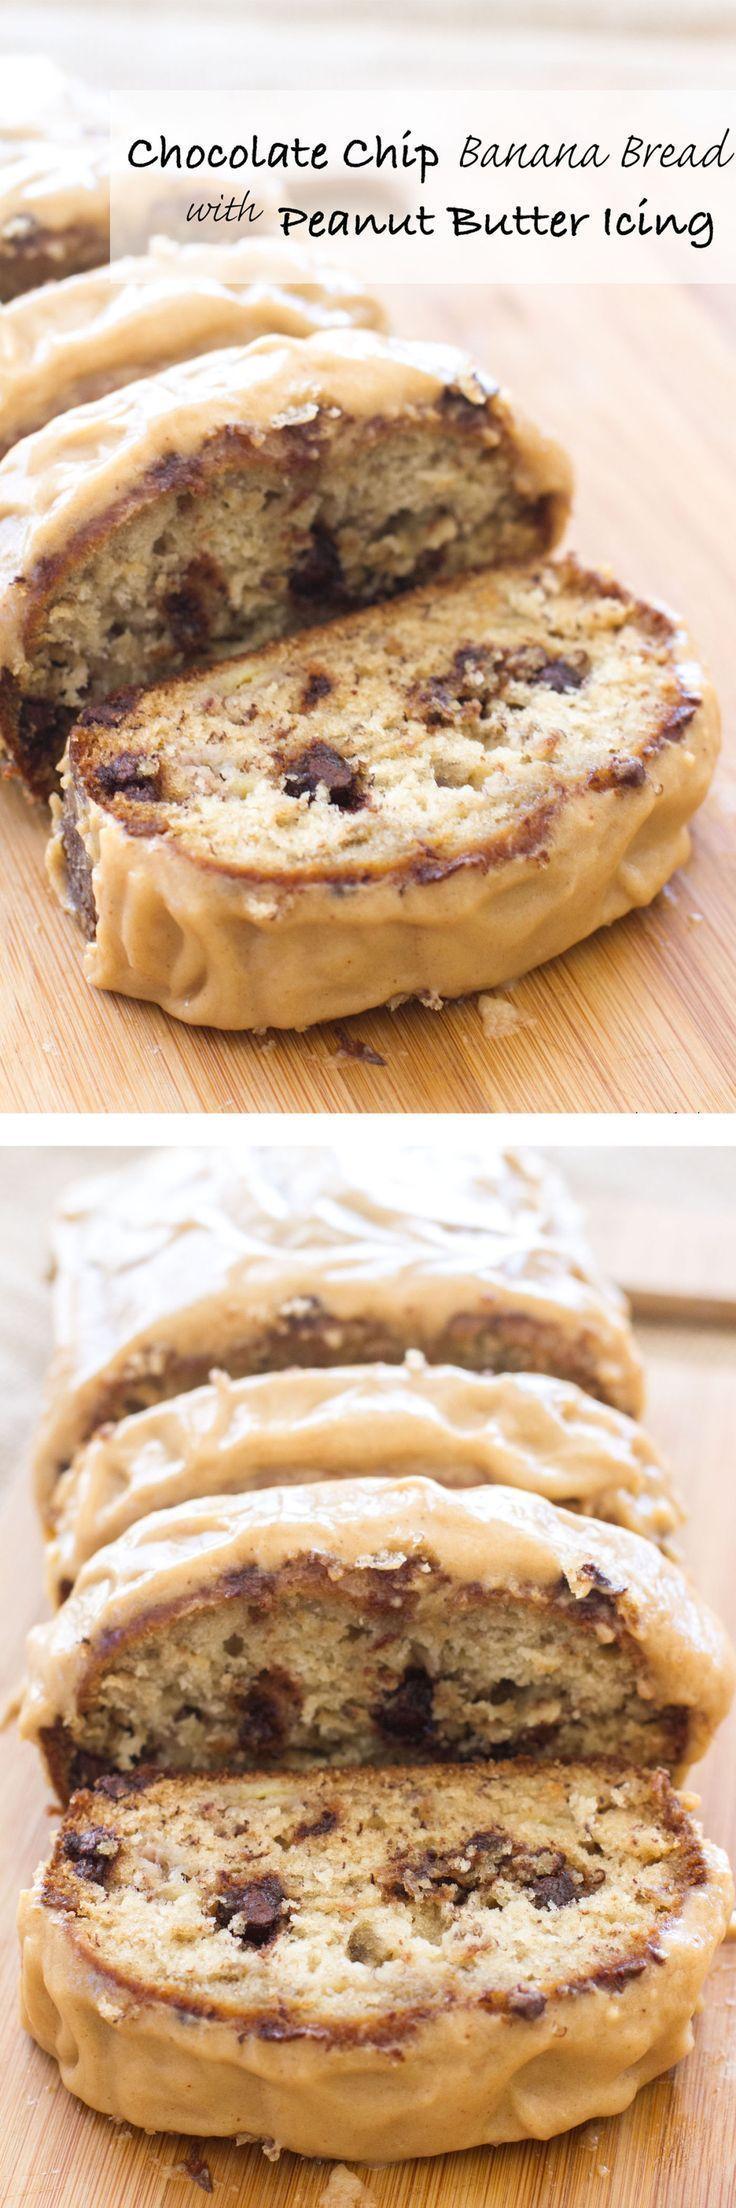 Best 10+ Chocolate chip banana bread ideas on Pinterest | Banana ...